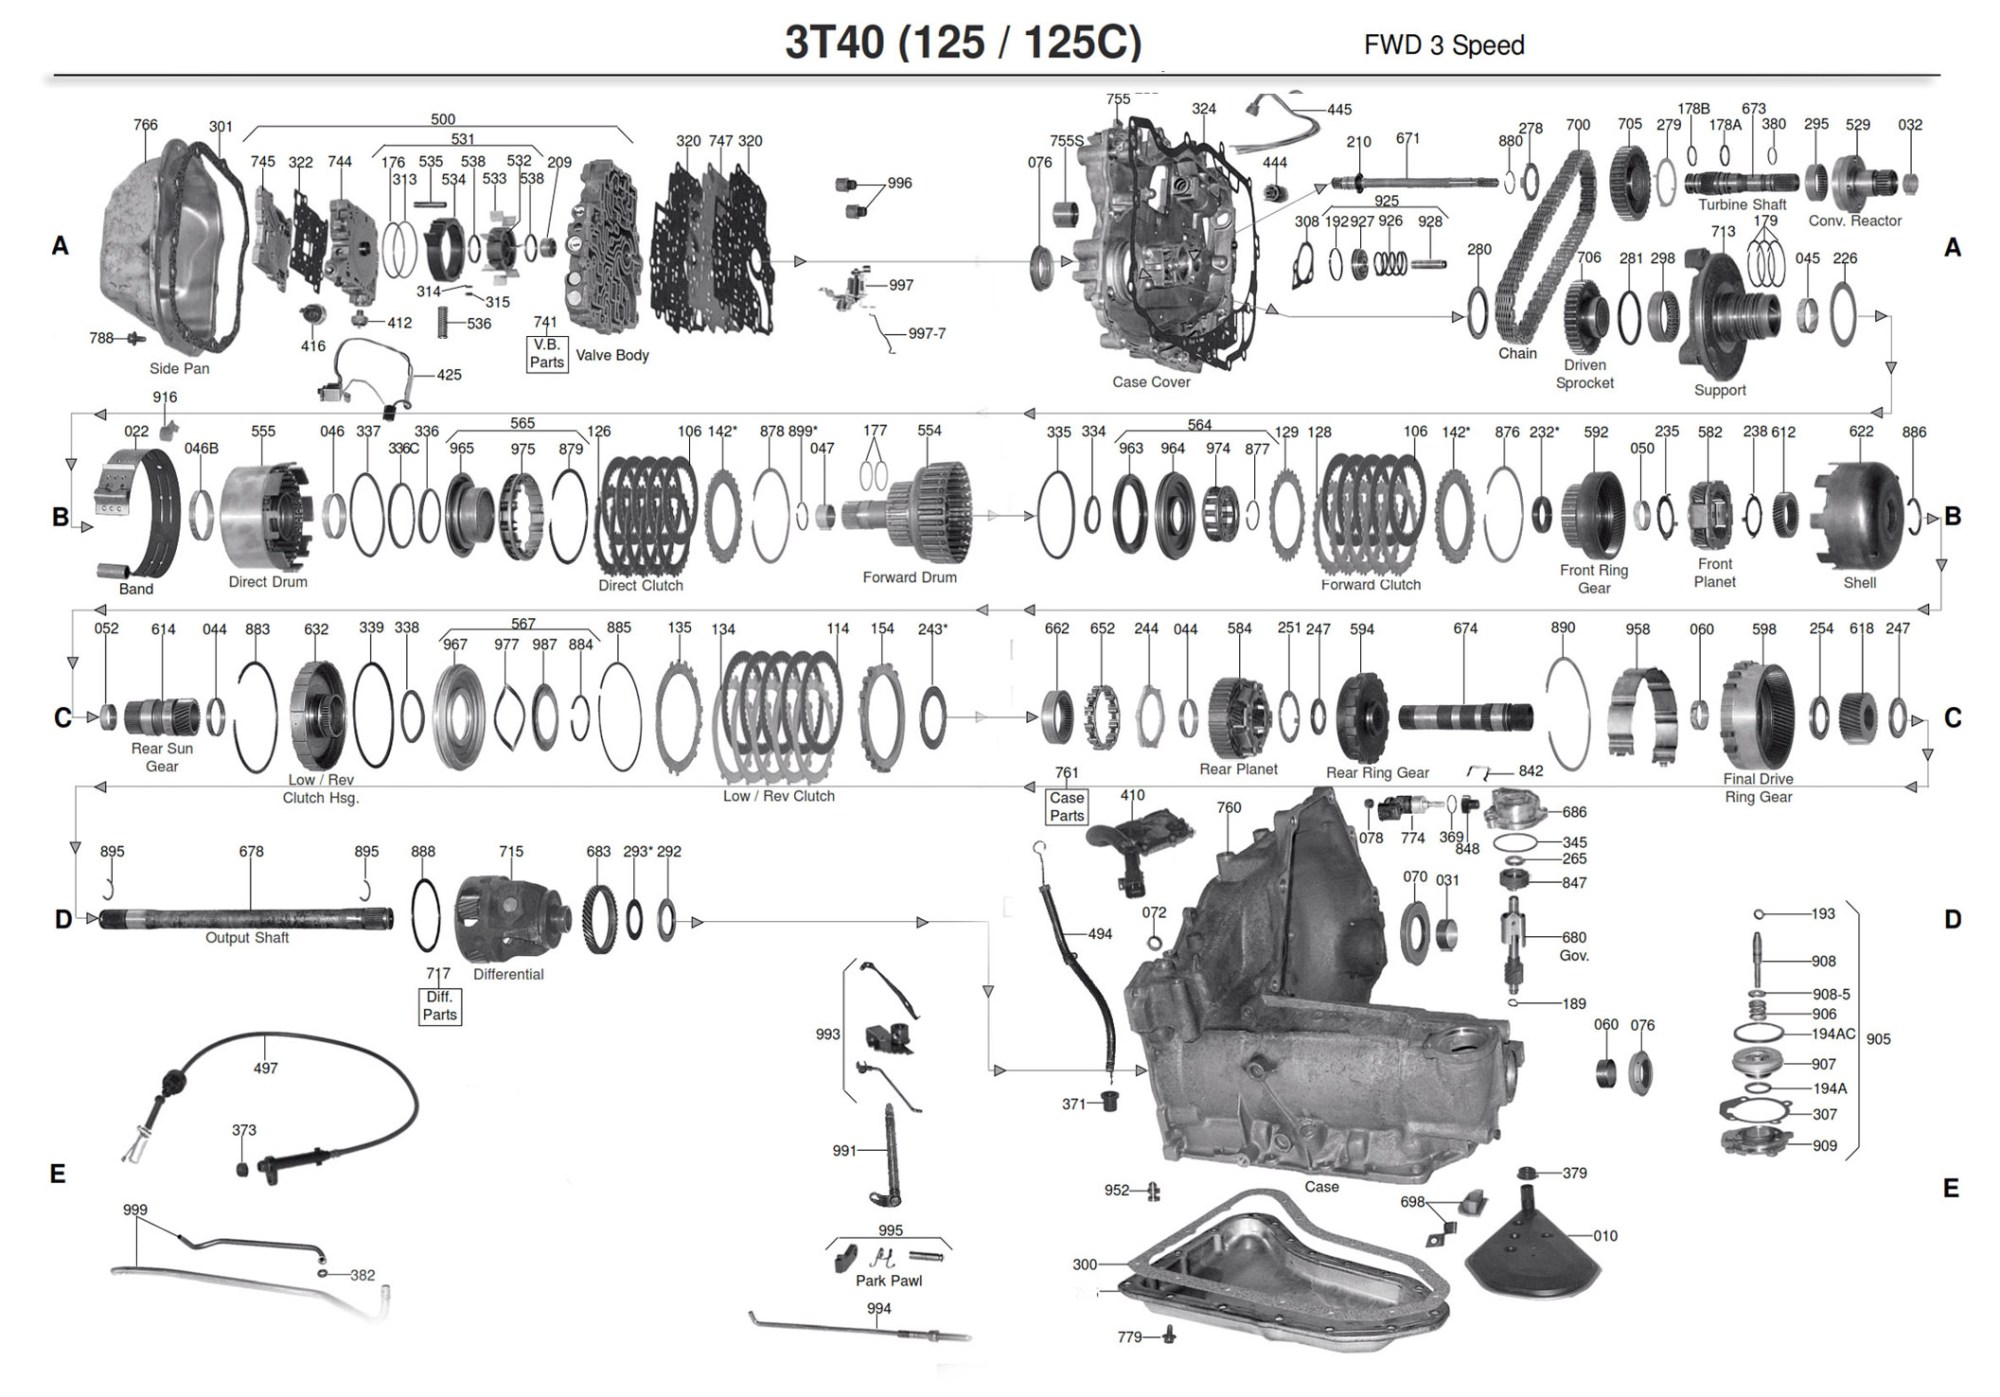 hight resolution of gm transaxle diagram wiring diagram expert gm 3t40 diagram wiring diagram for you gm transaxle diagram